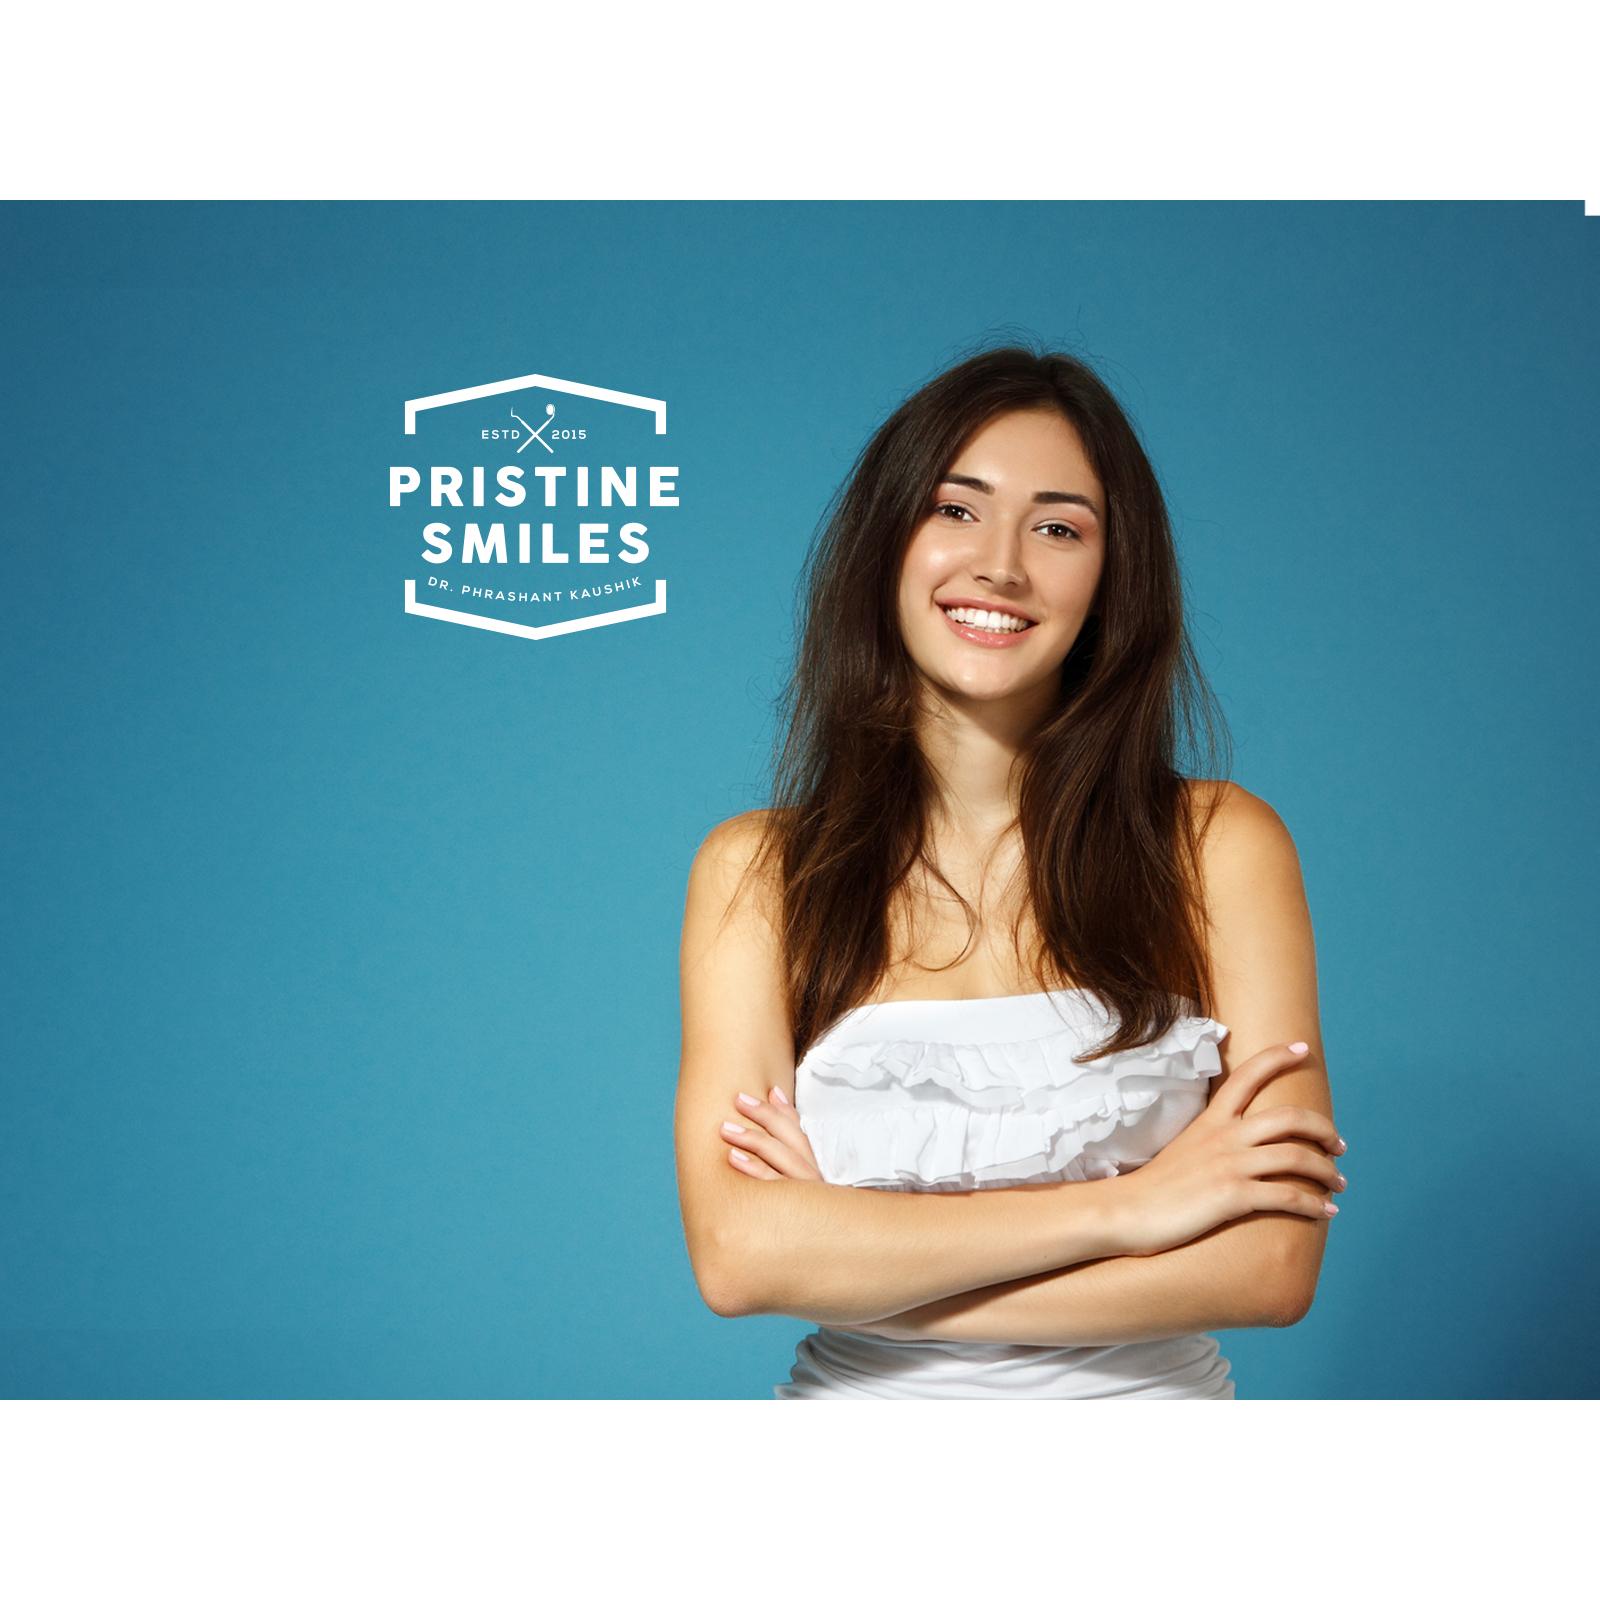 Pristine Smiles of Rockwall: Dr. Prashant Kaushik, DMD